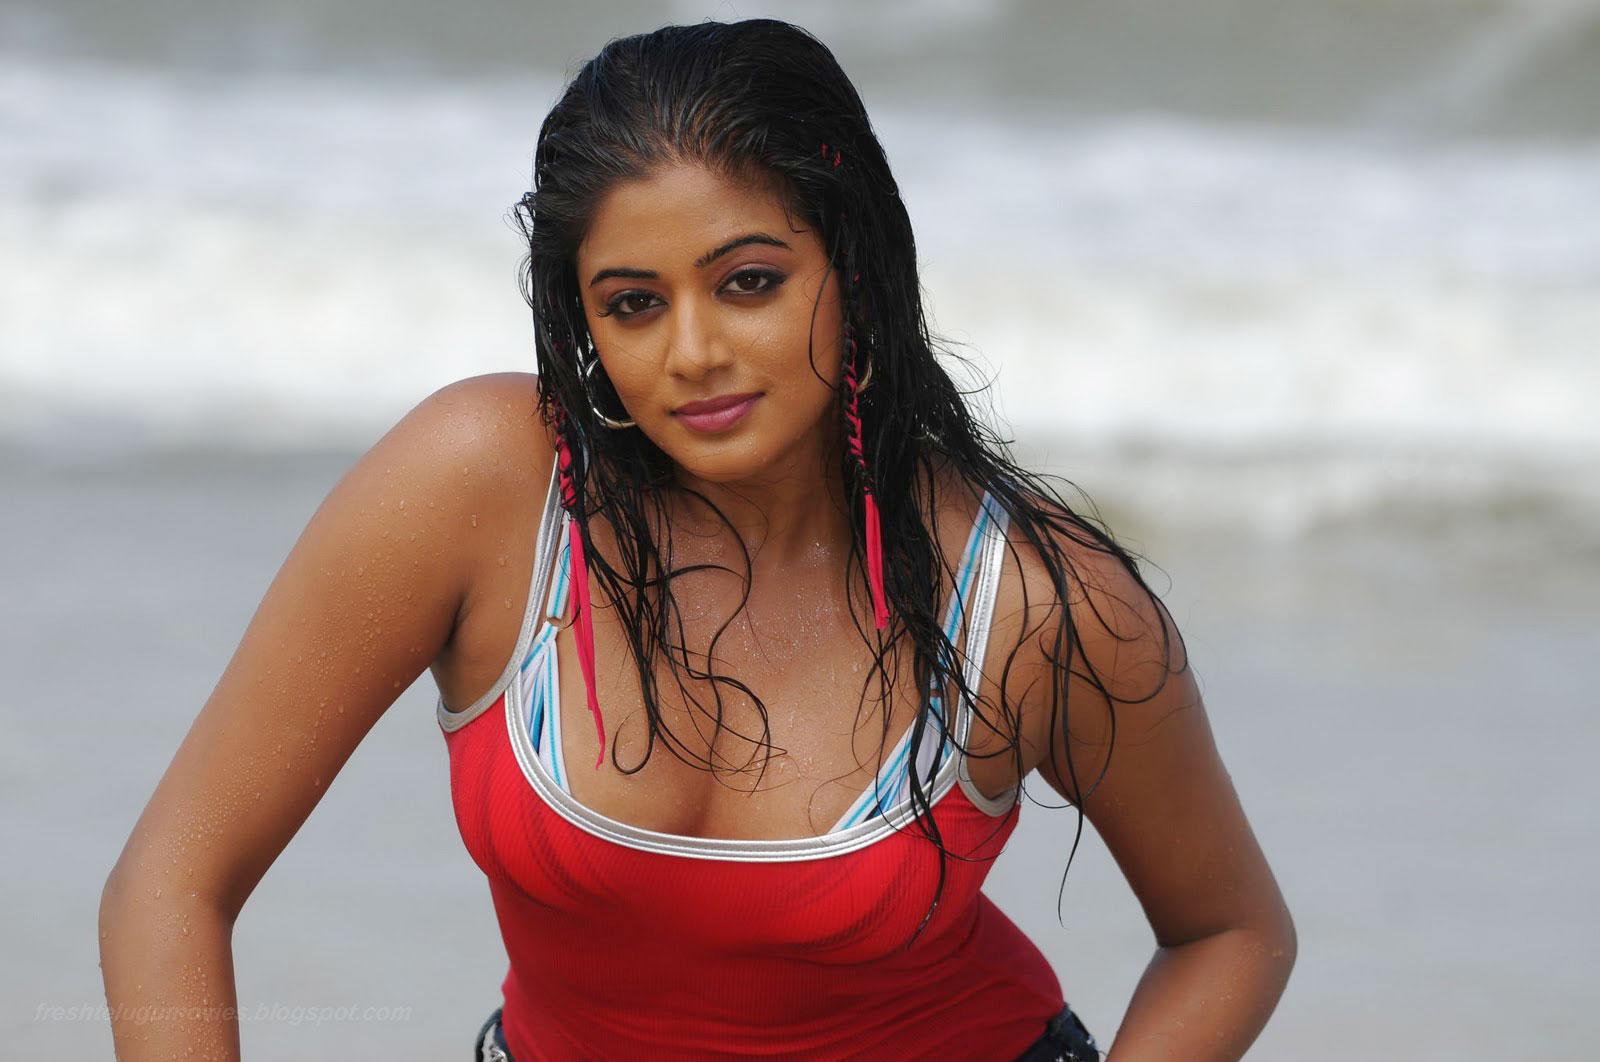 fox-klubz: tamil actress priyamani latest new photoshoot at beach